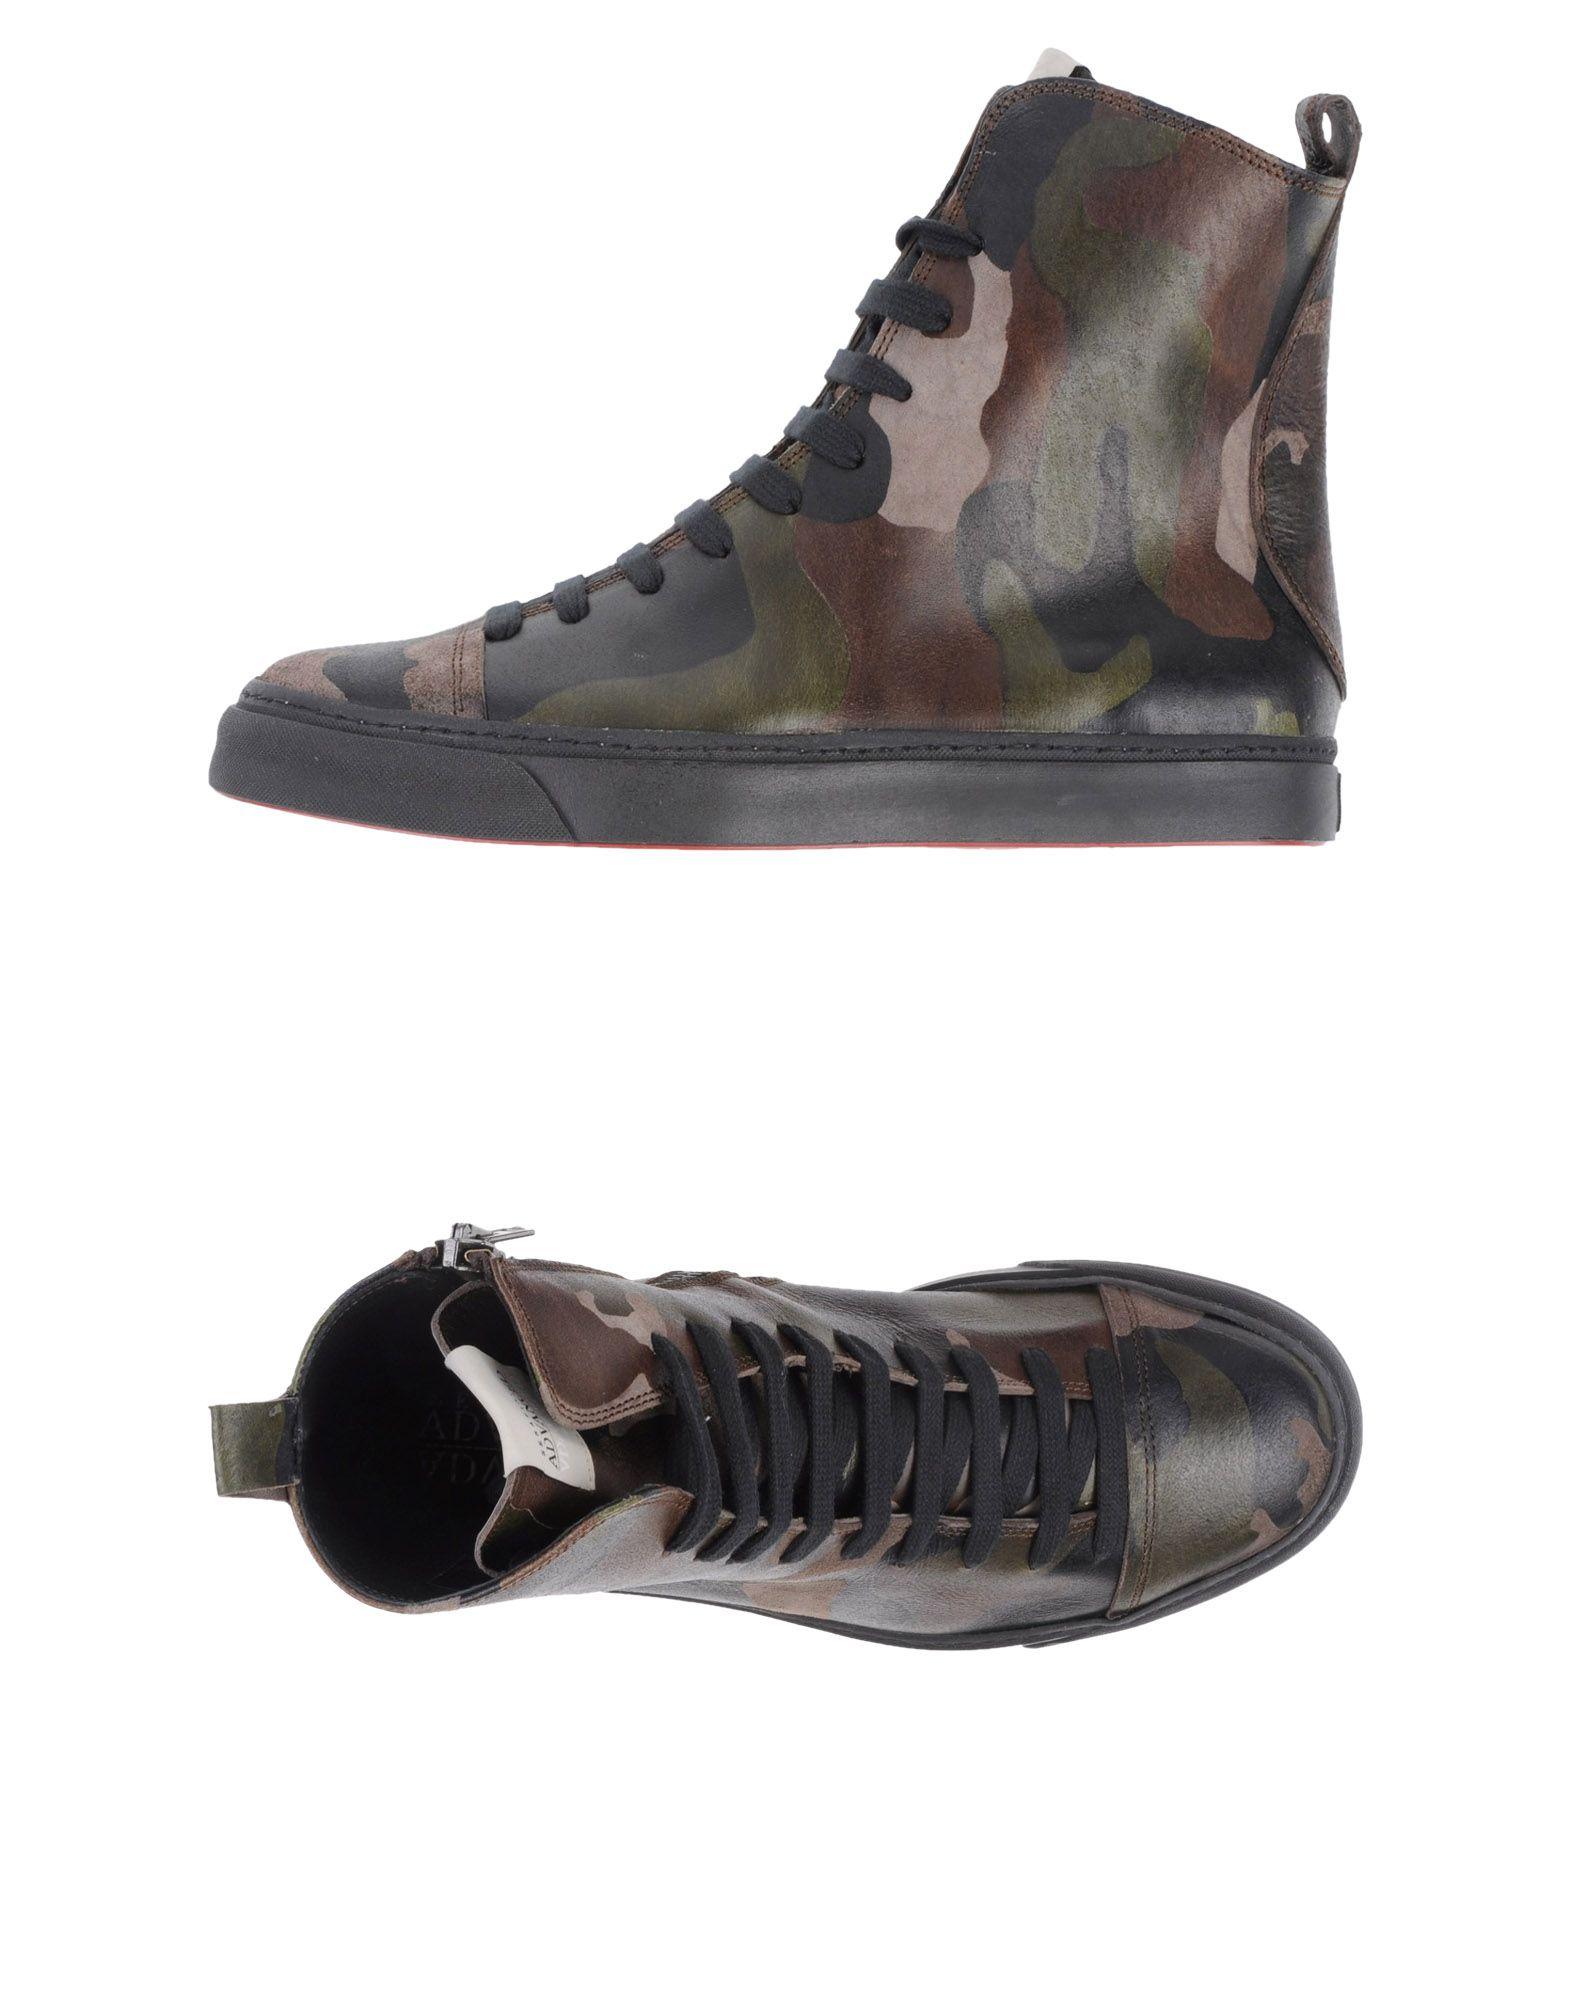 SERAFINI Sneakers in Military Green